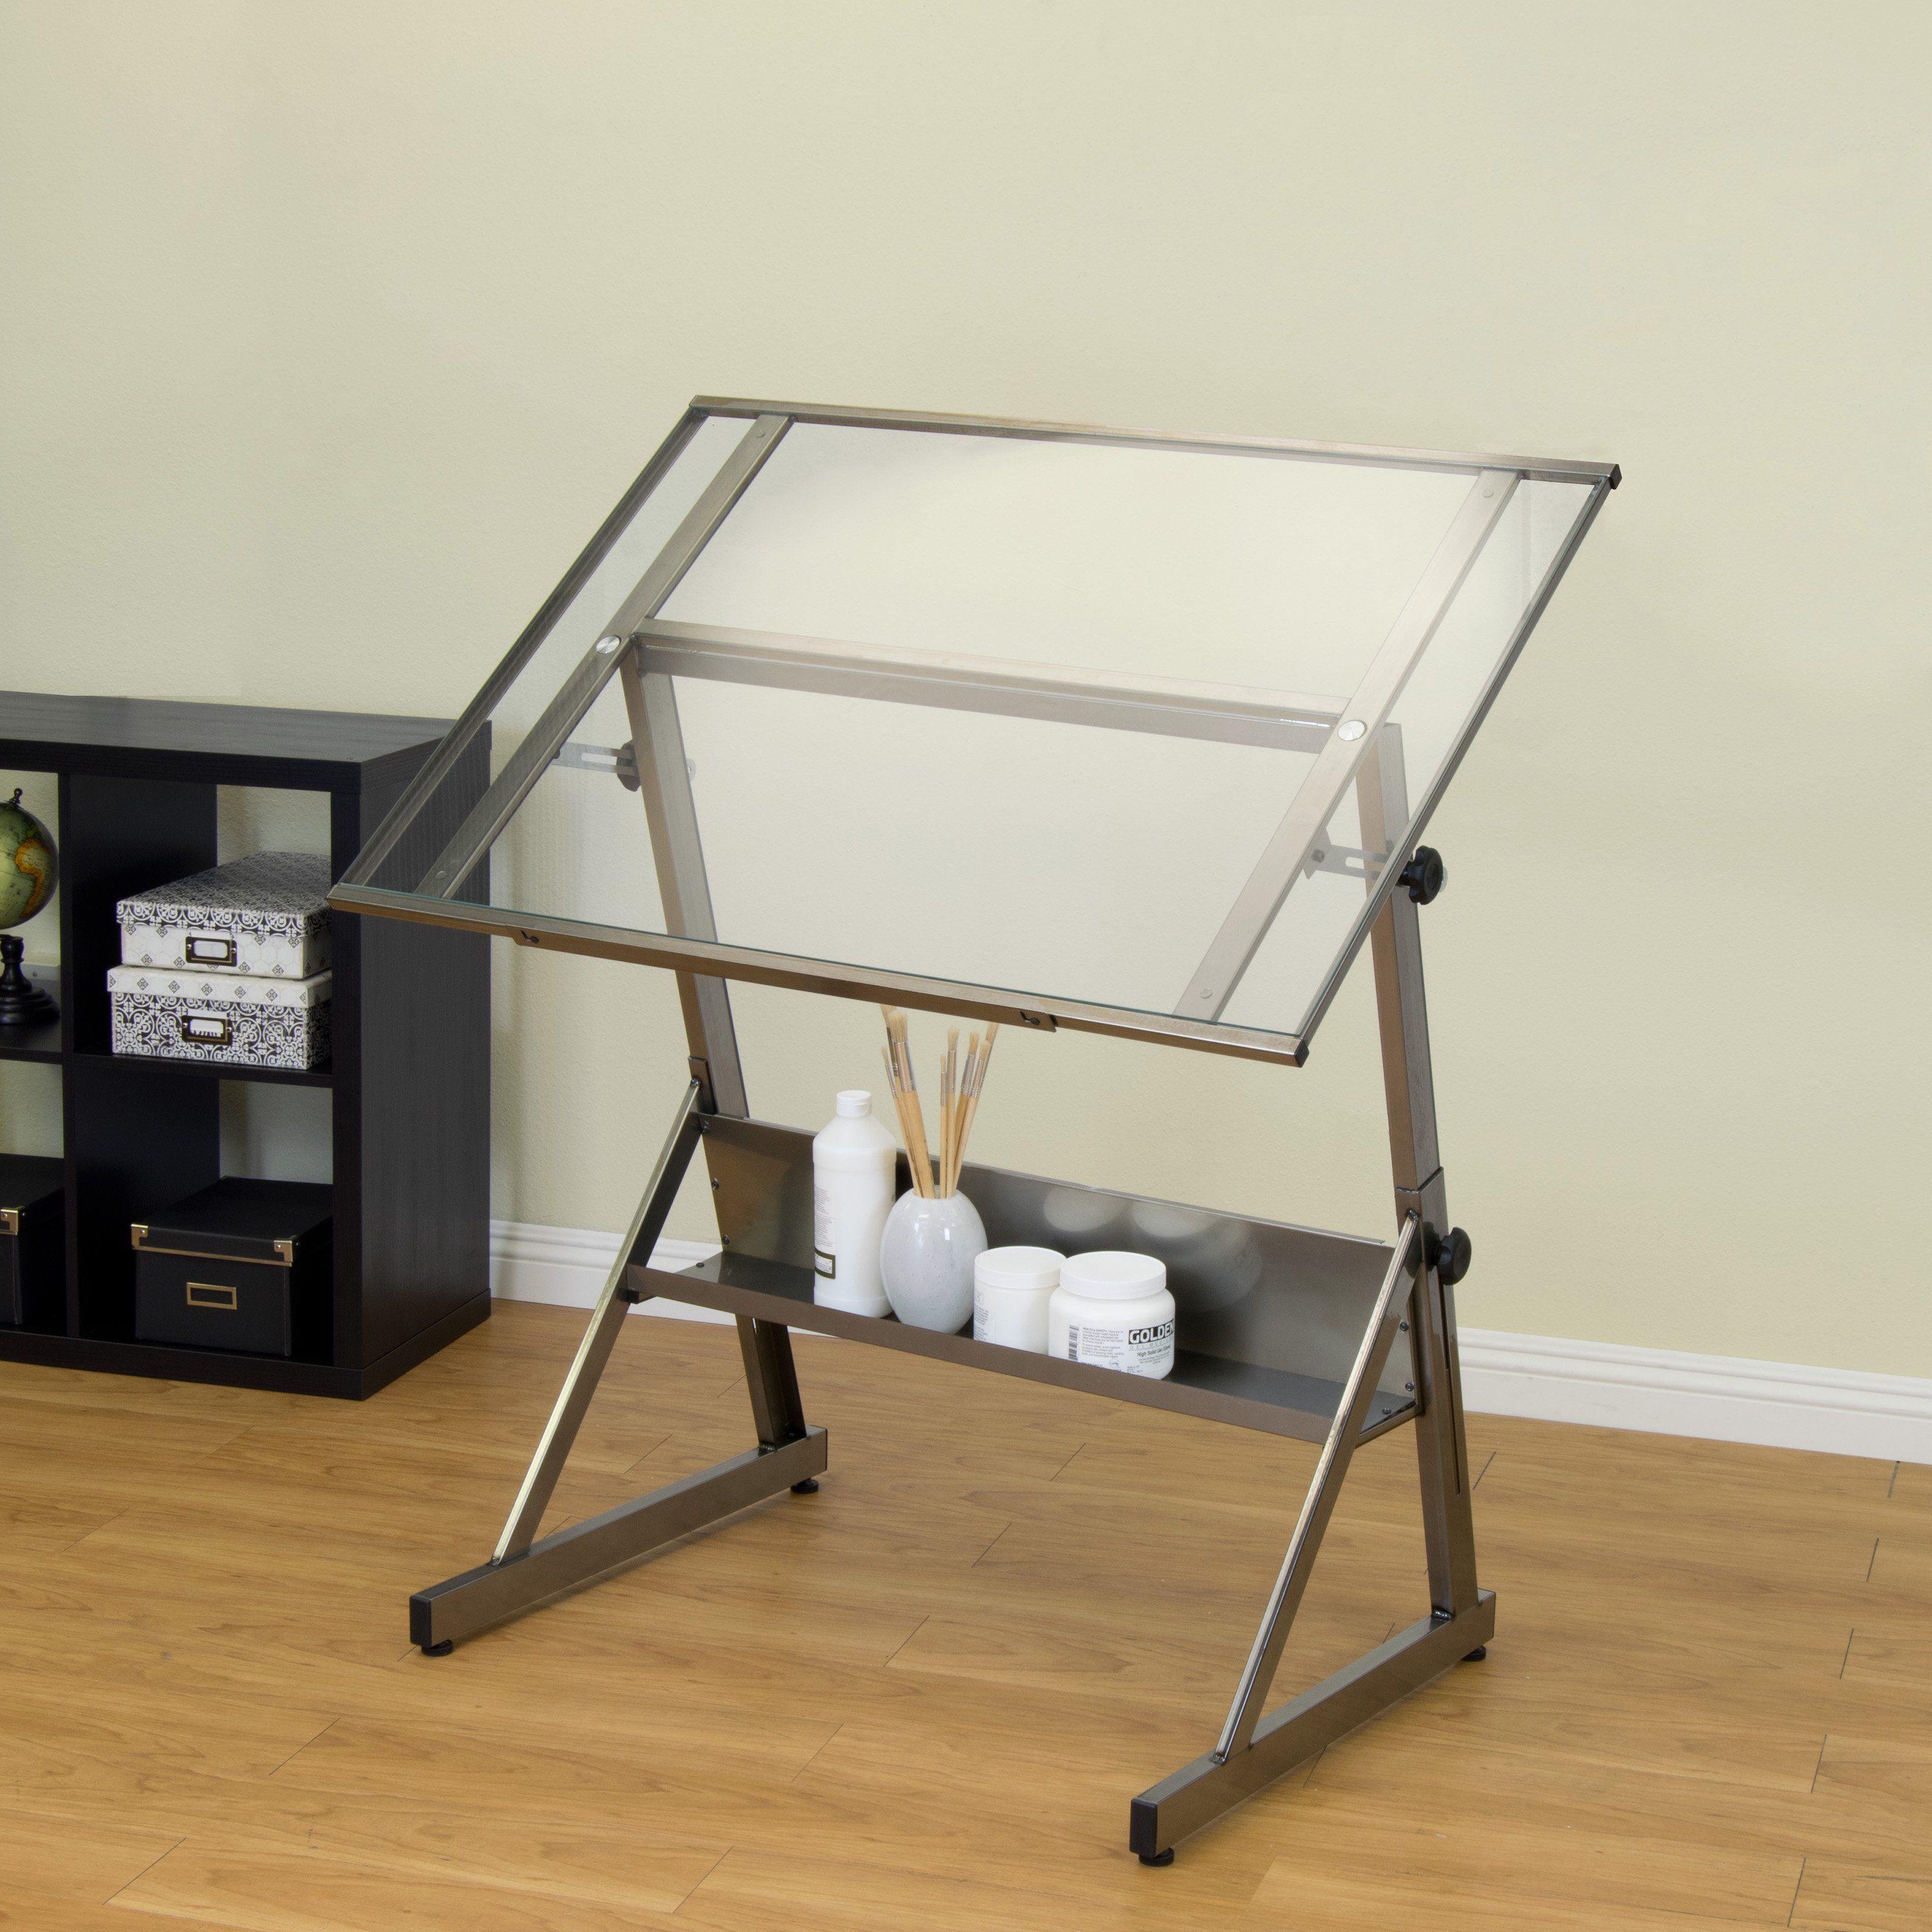 Studio Designs Solano Adjustable Glass Drafting Table Www Hayneedle Com Drafting Table Design Table Design